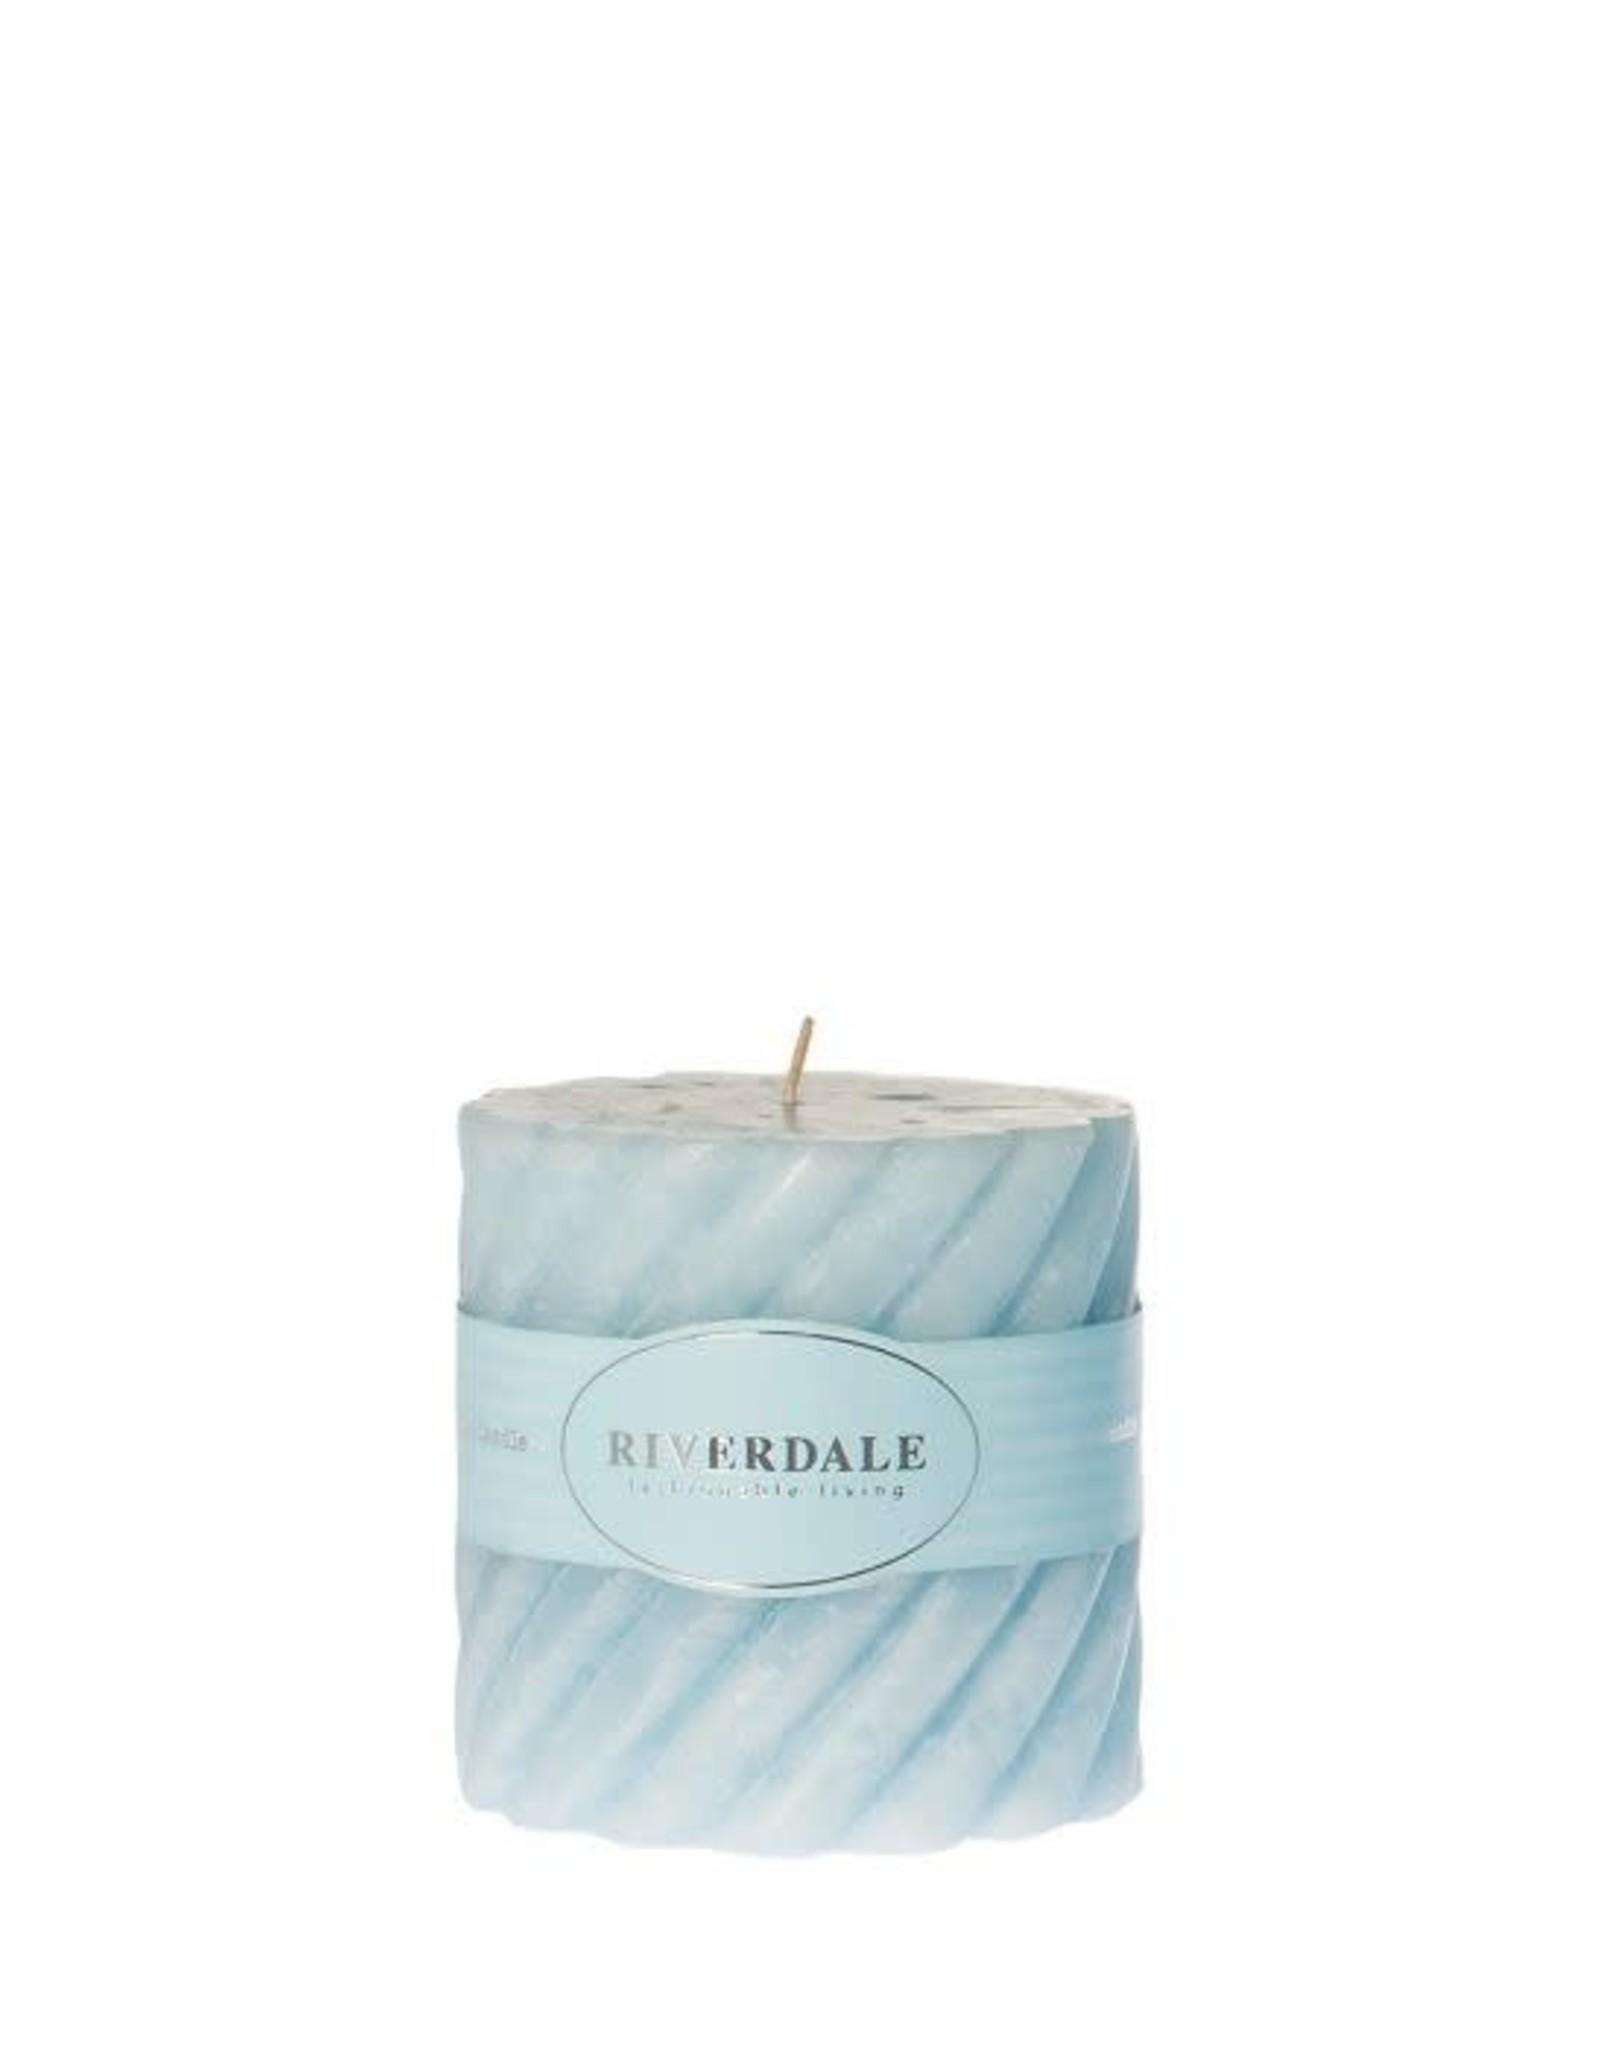 Riverdale Kaars Swirl licht 7,5x7,5cm